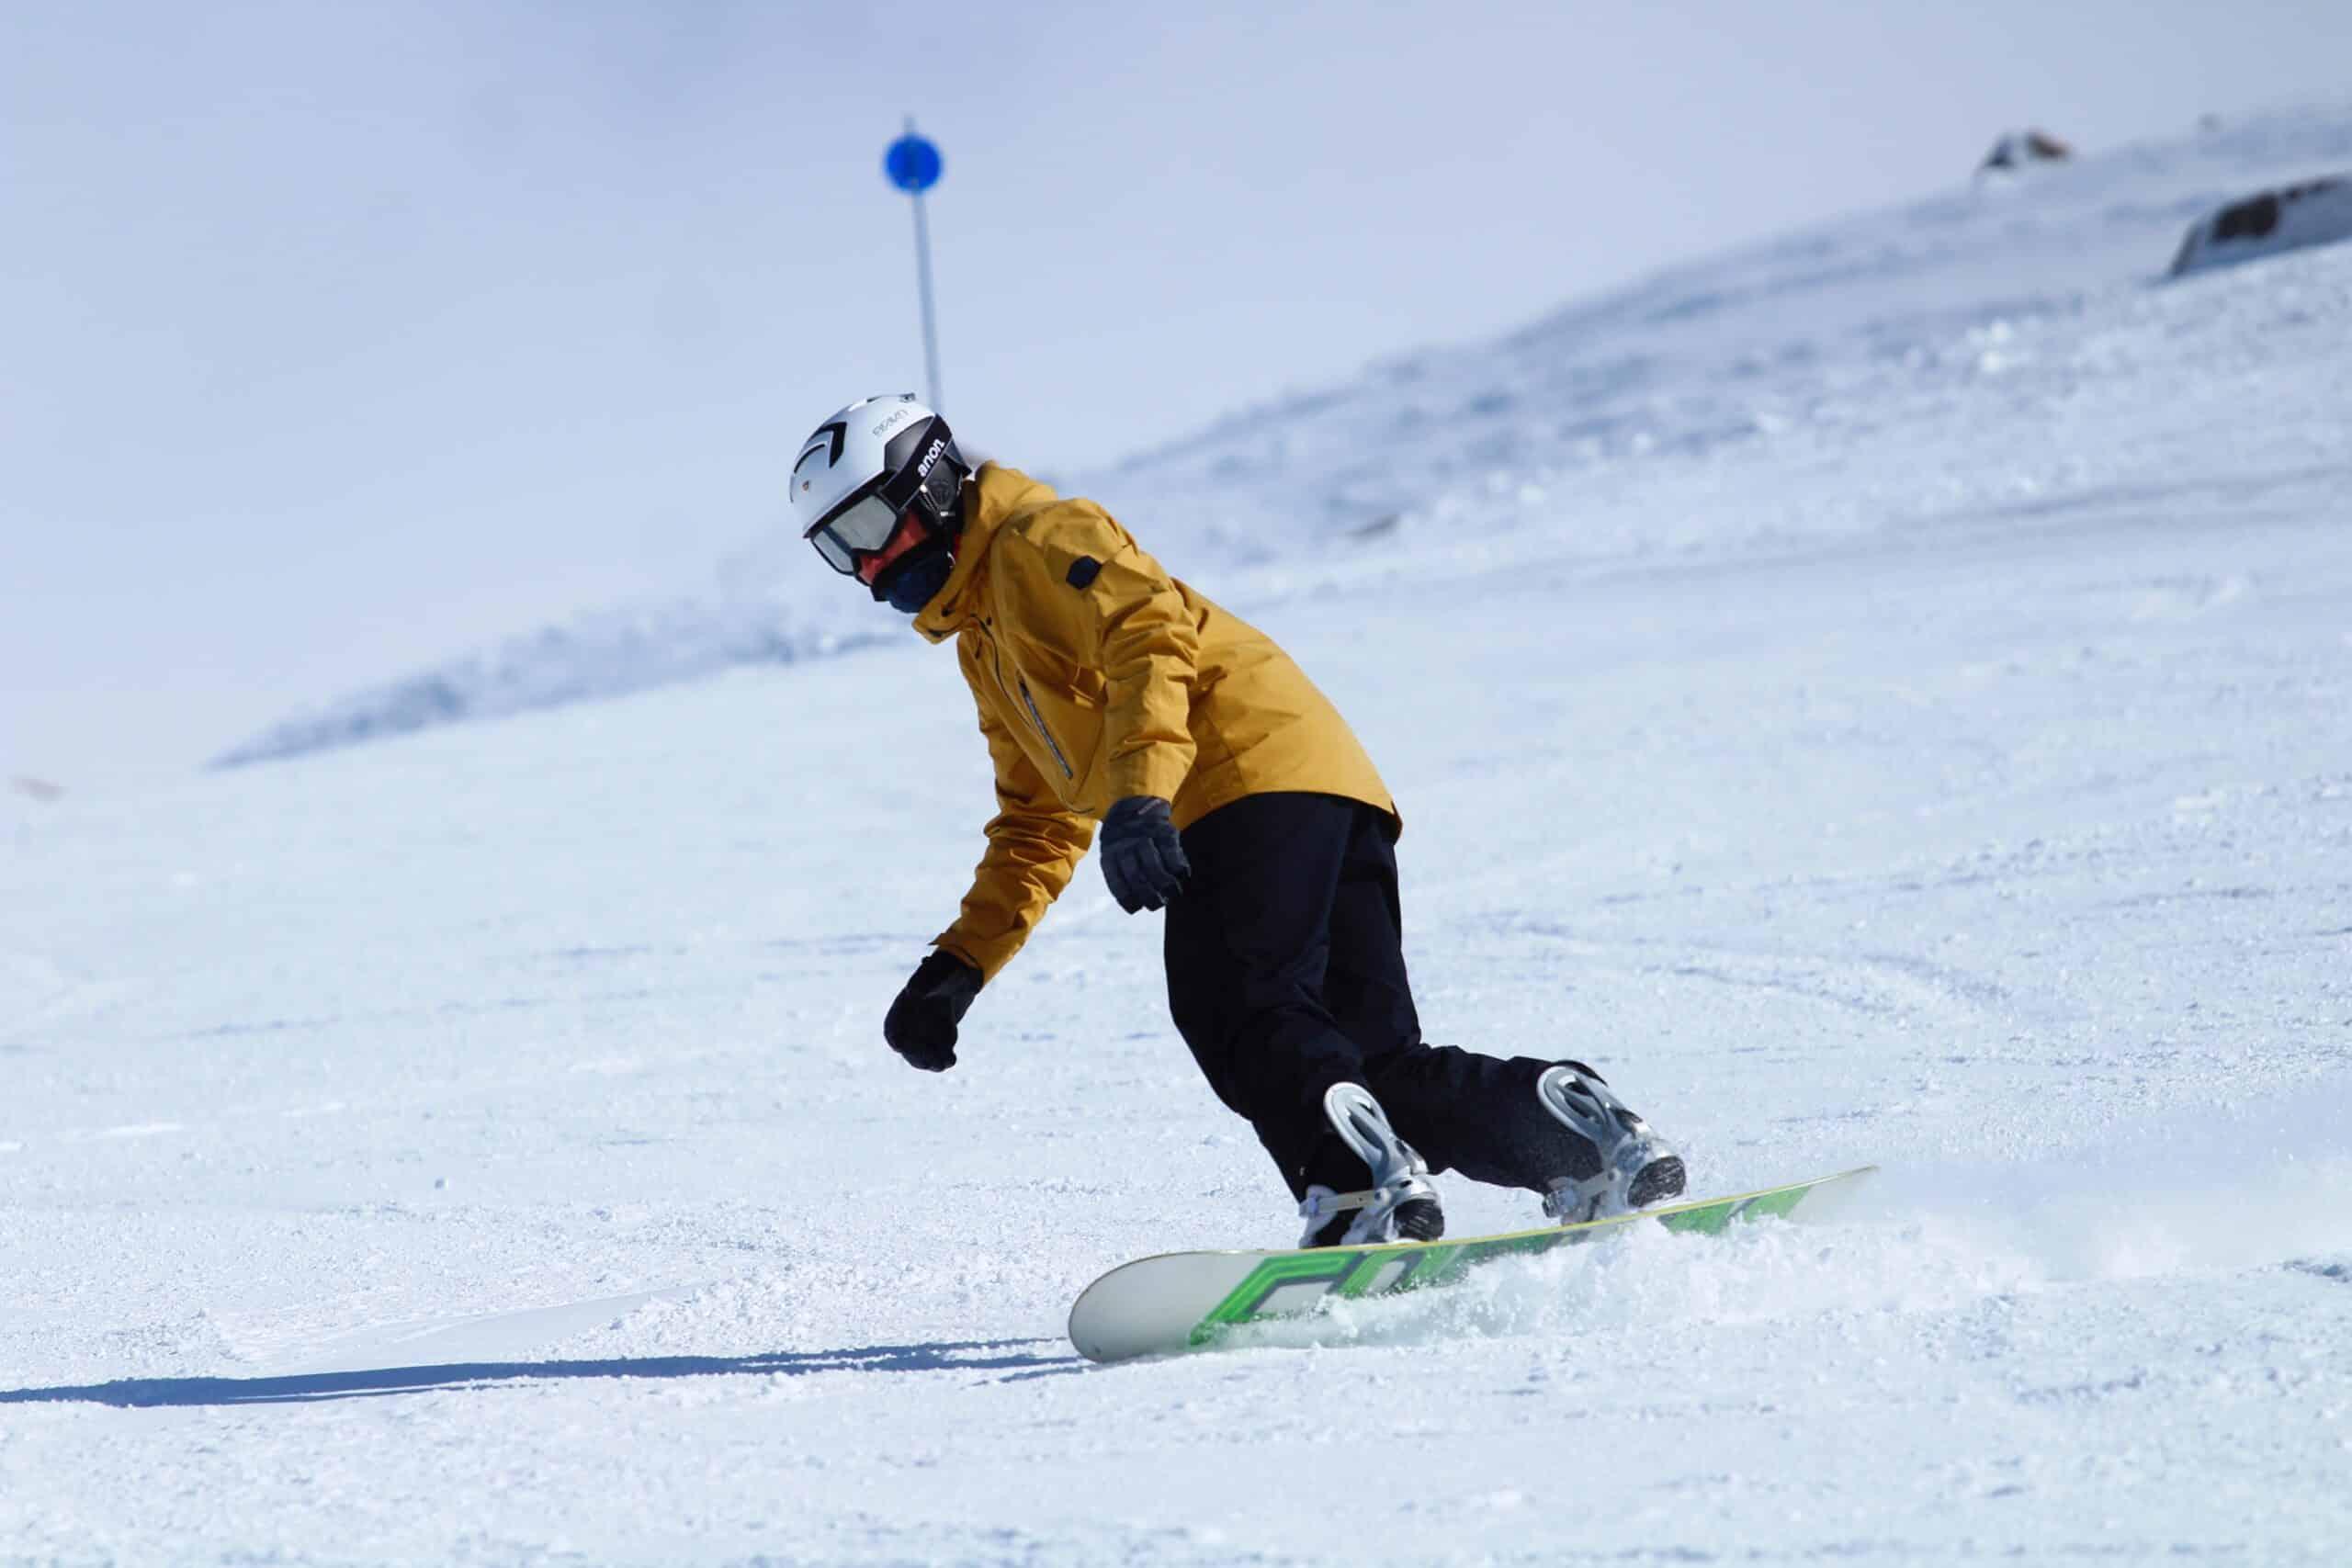 man turning on snowboard